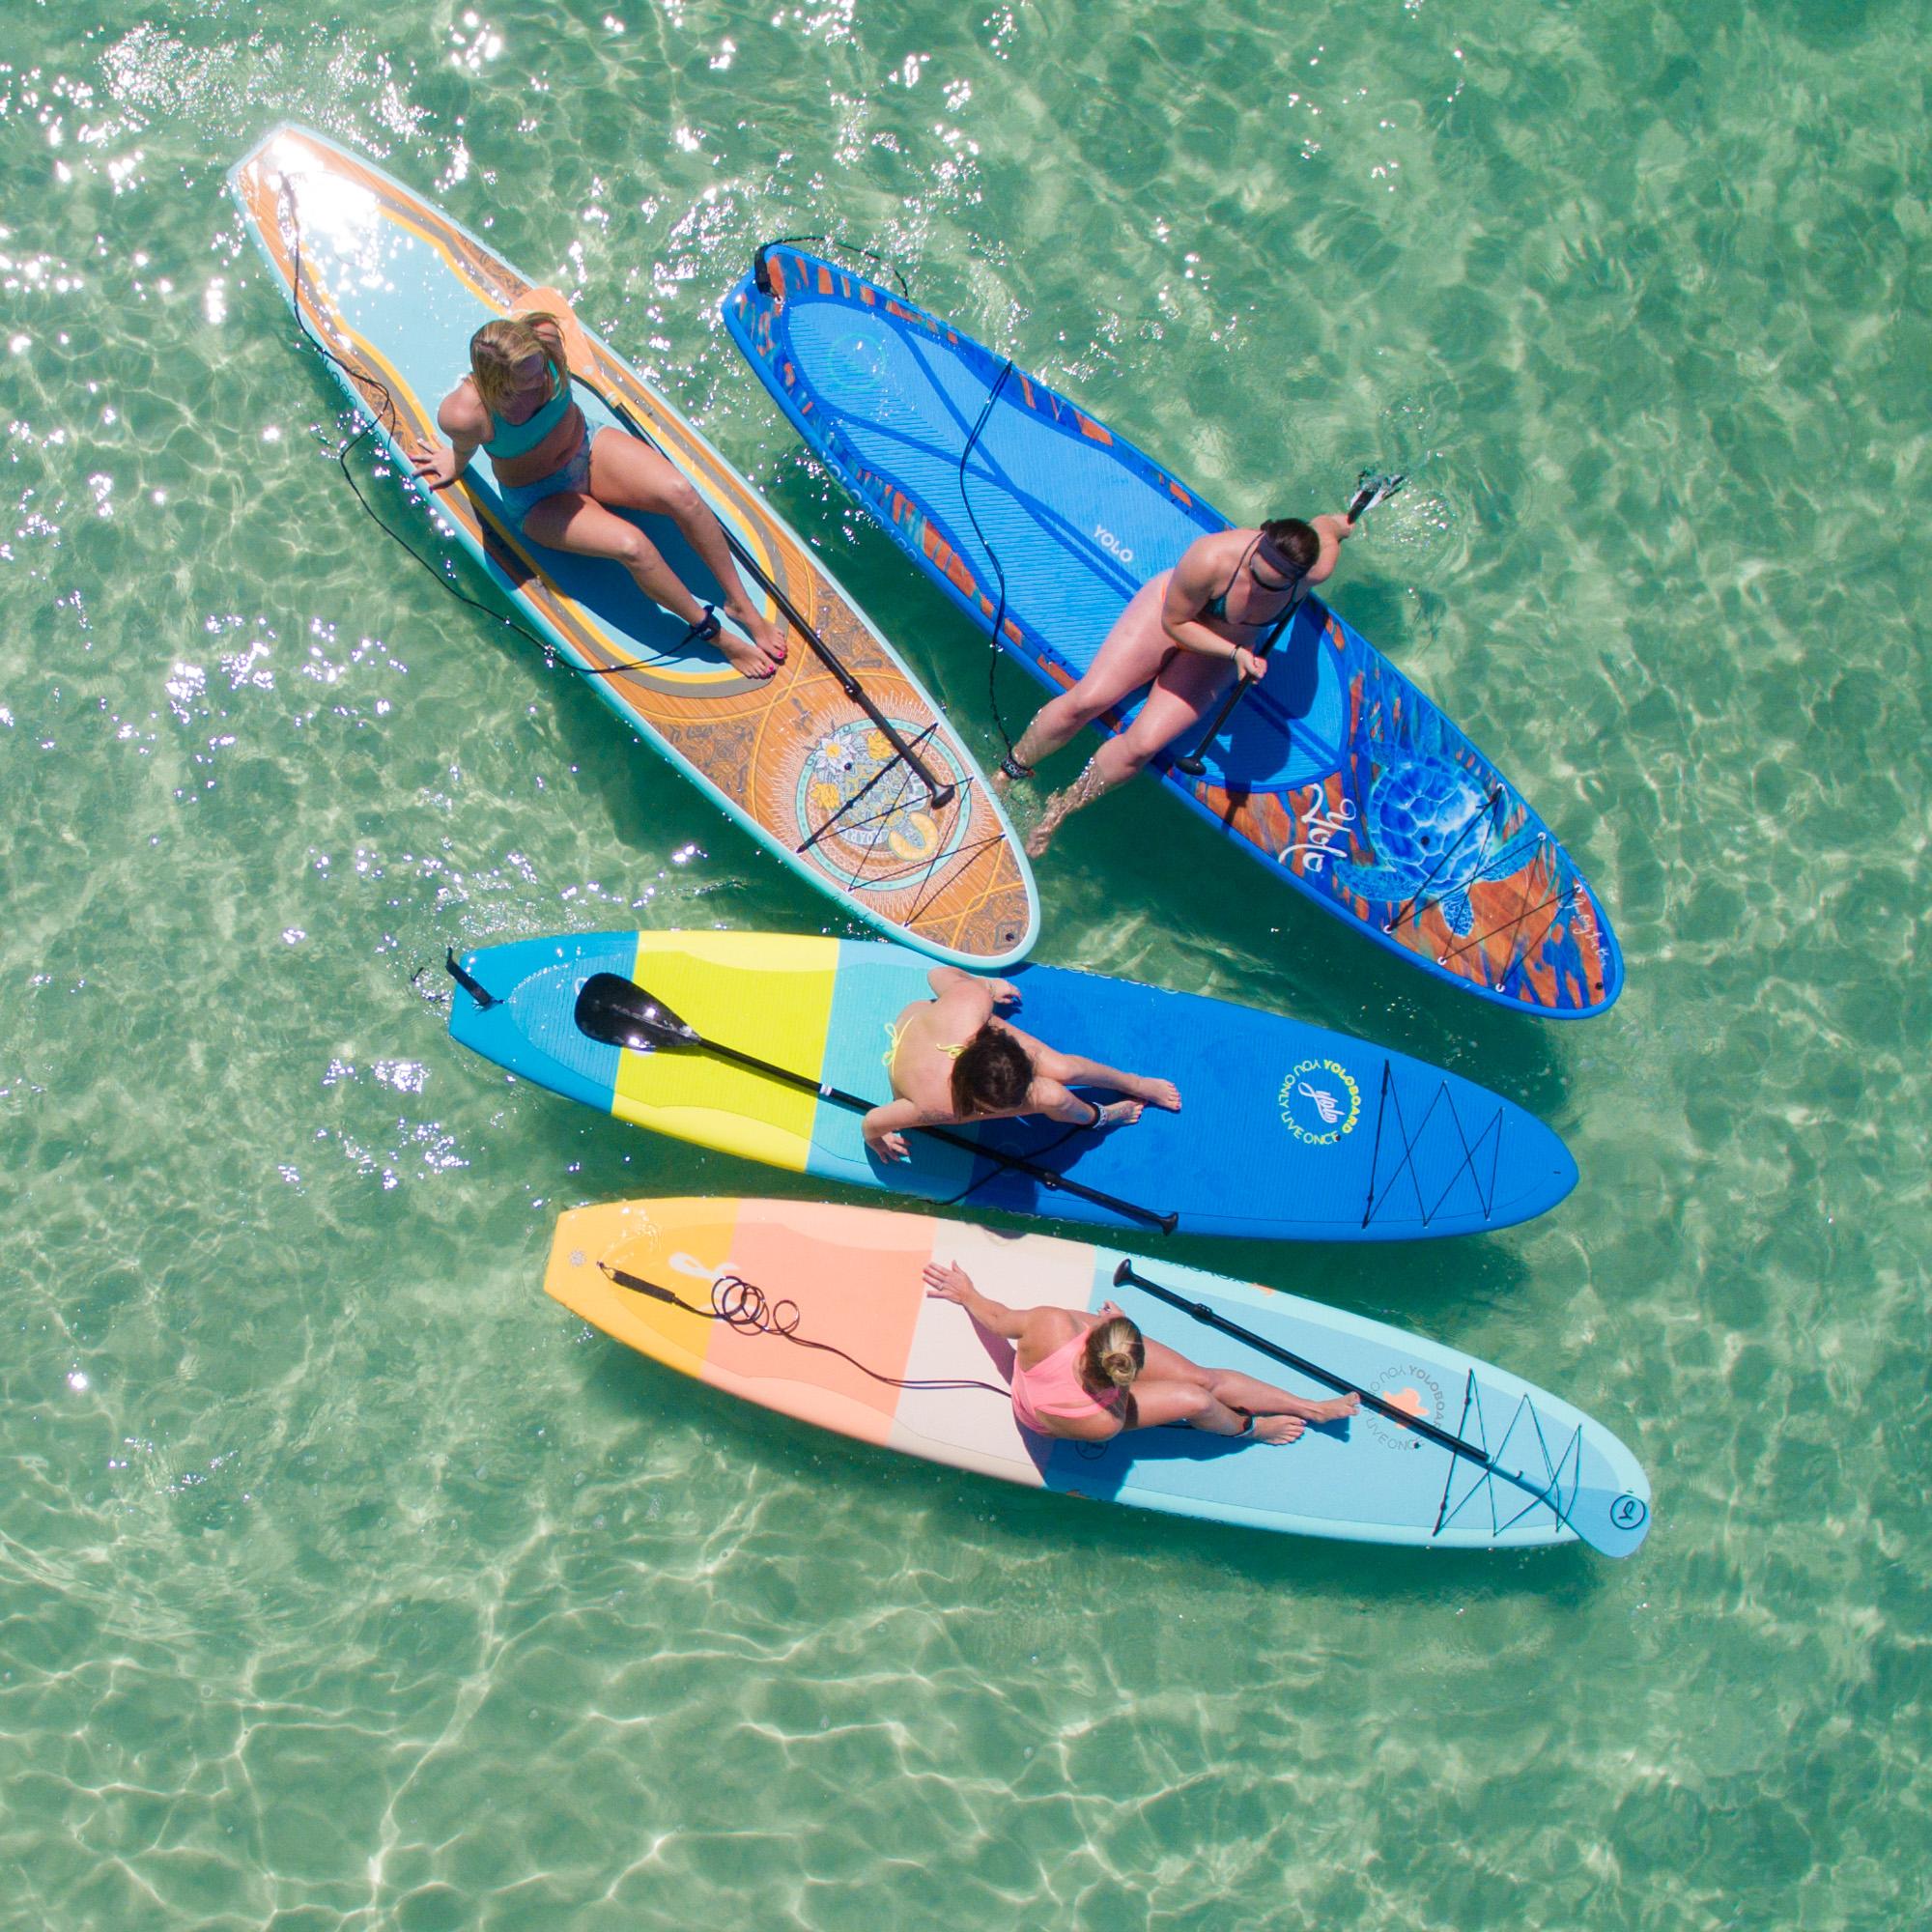 Coastal_Crusier_Paddle_Board_DJI_0542.jpg